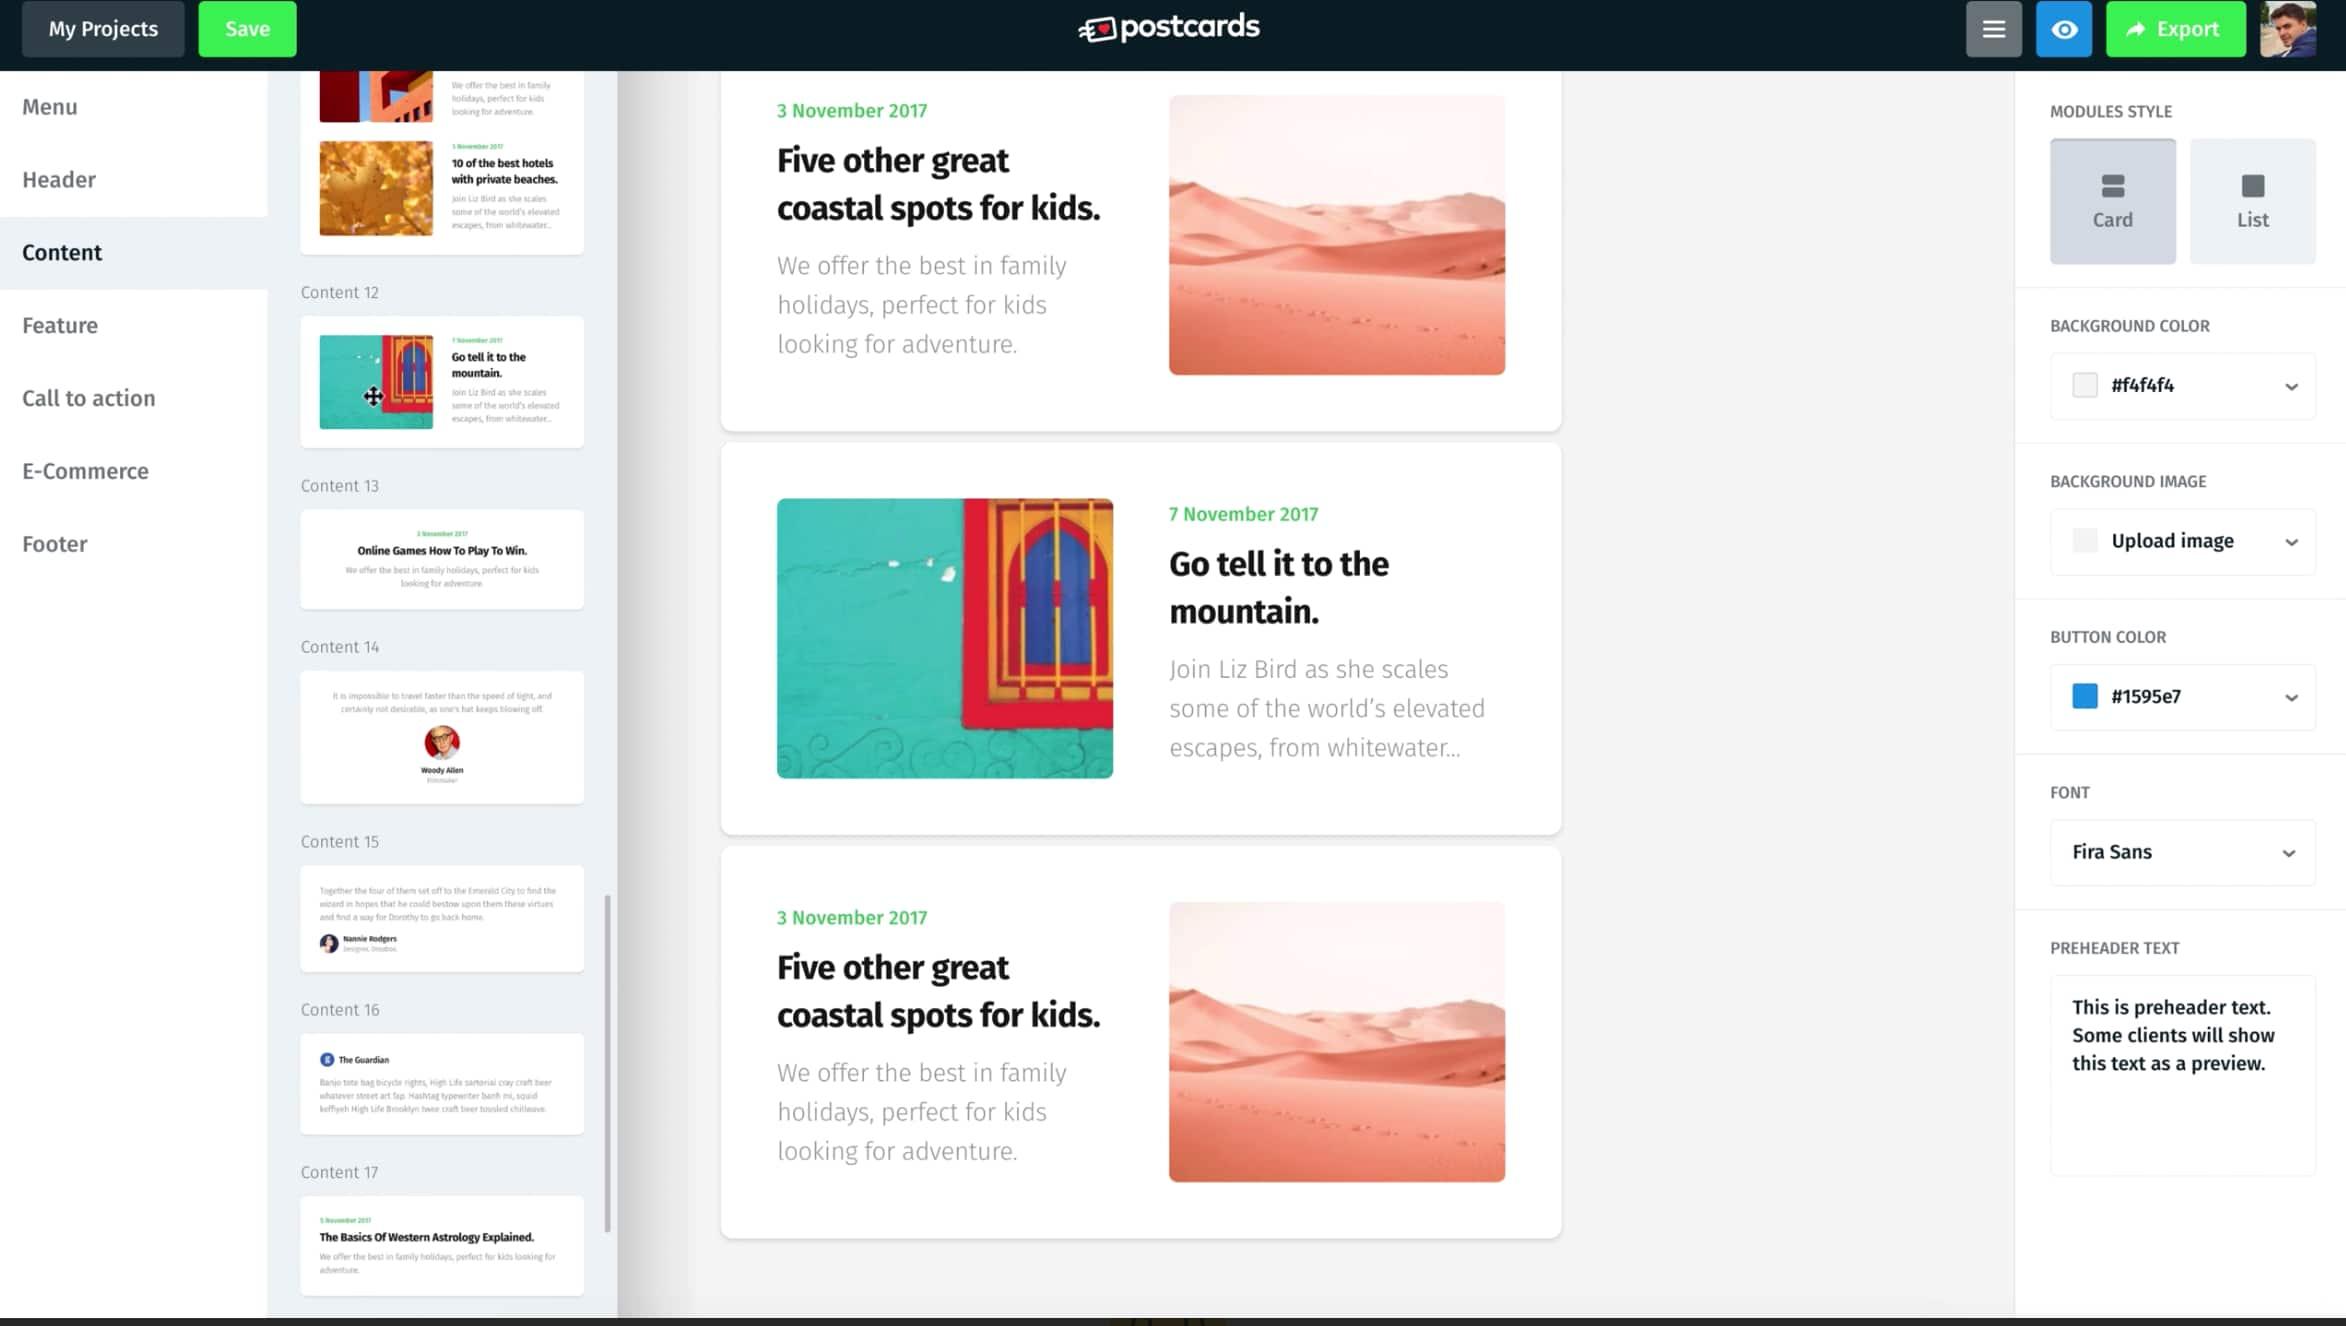 Newsletter Software Tools: Postcards